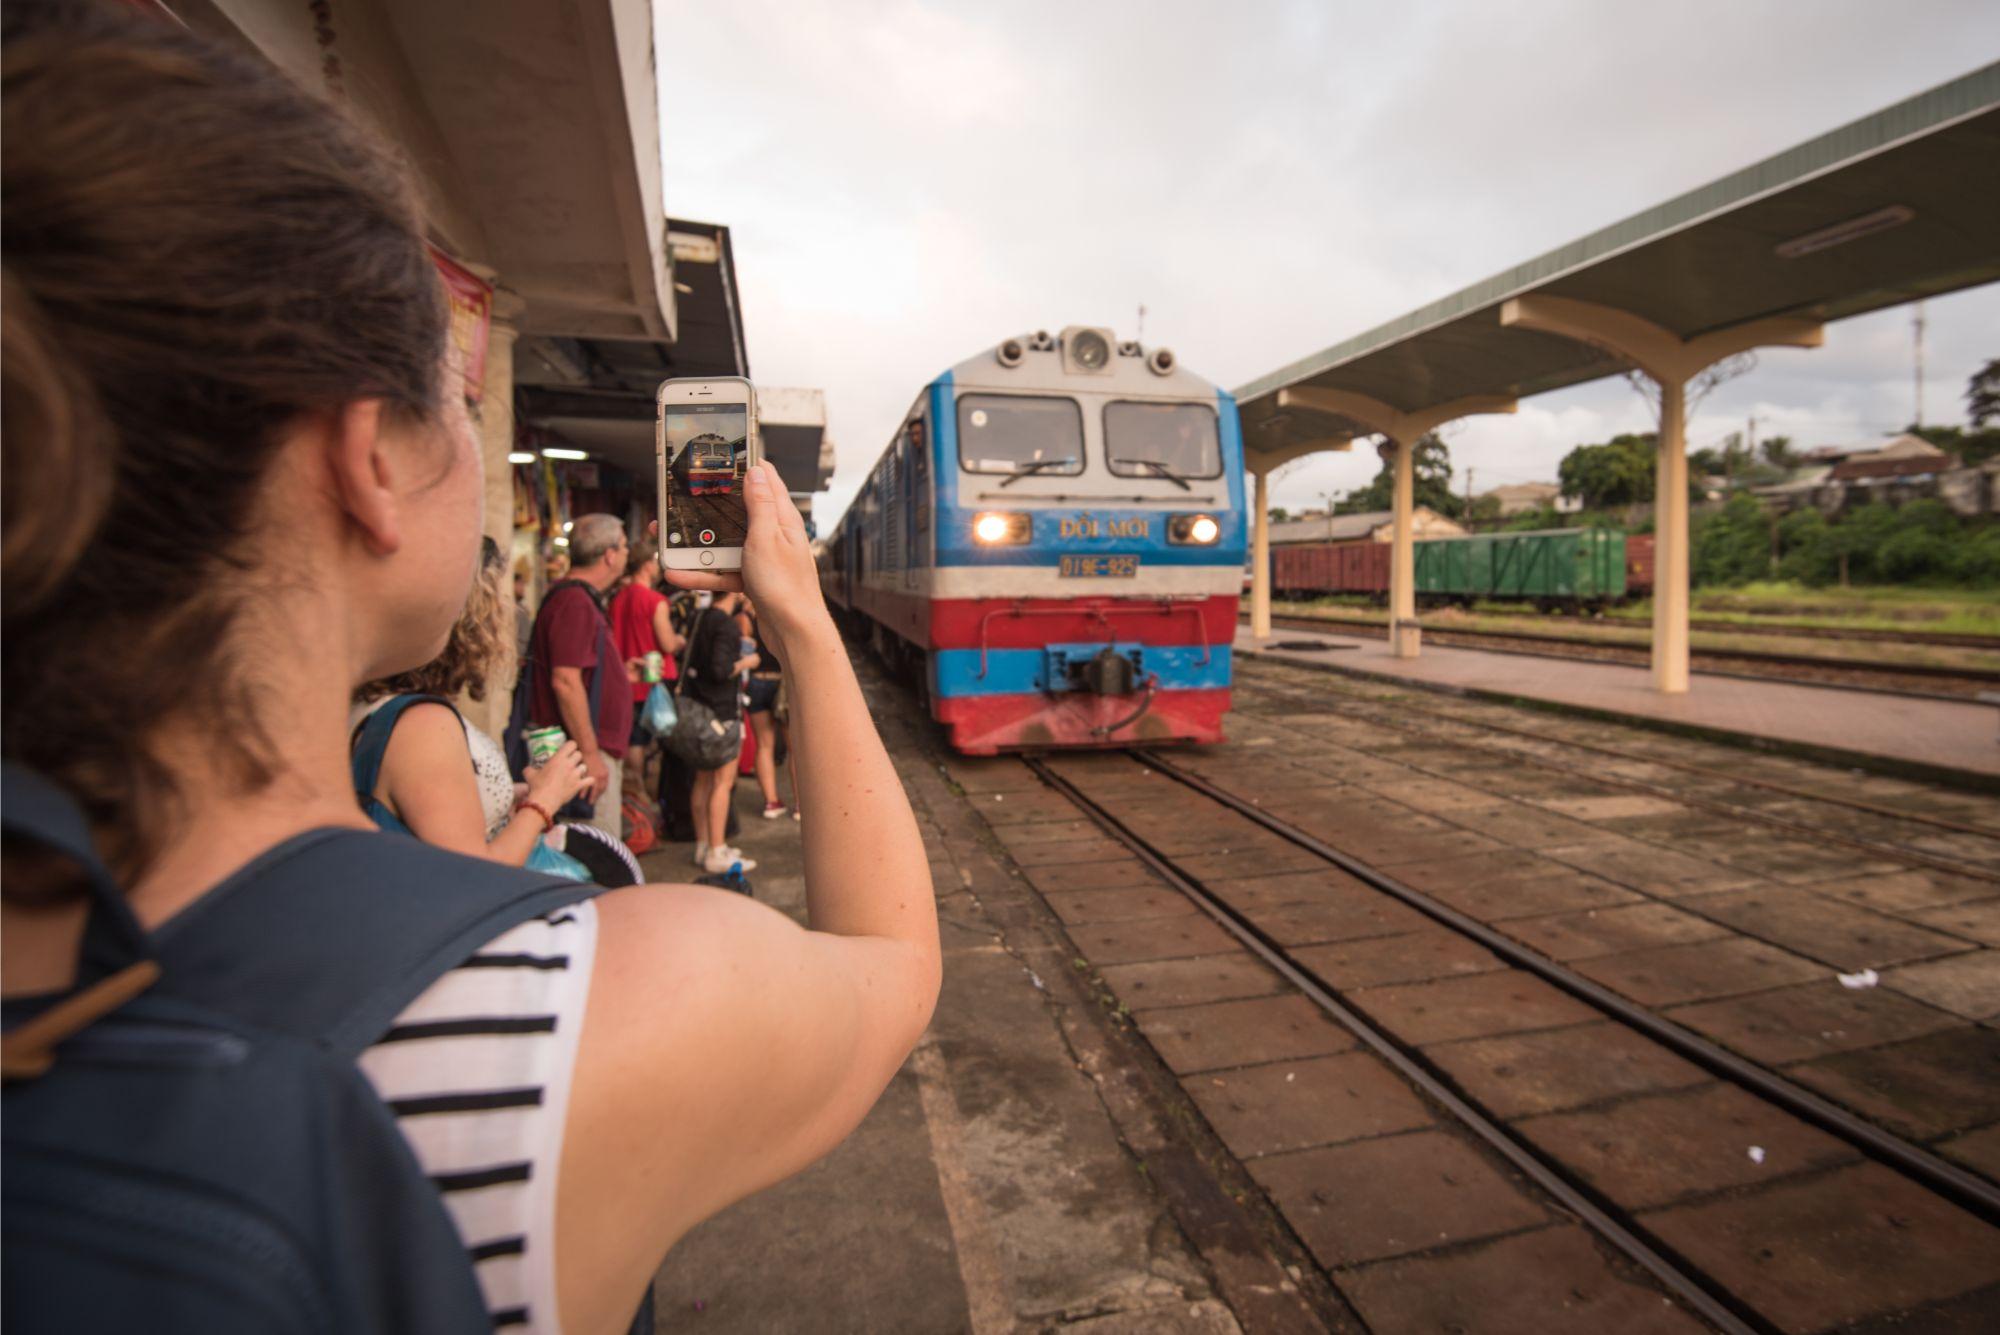 Vietnam_Hue_Train_4823.jpg